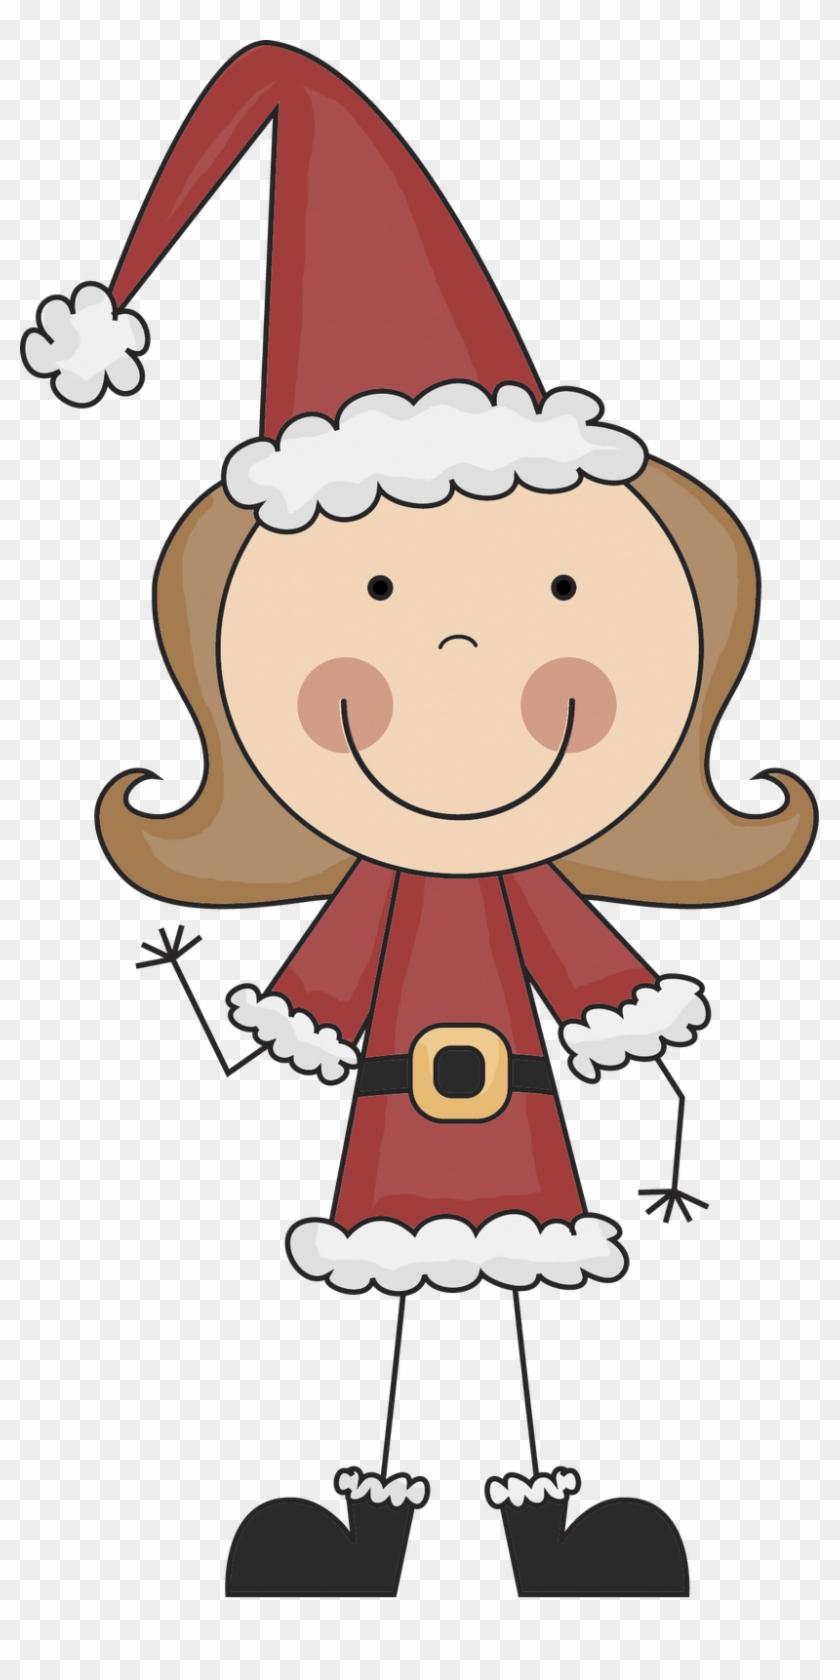 Cute Santa Claus Clipart Hd Wallpapers Wallpaper Scrappin Doodles Christmas